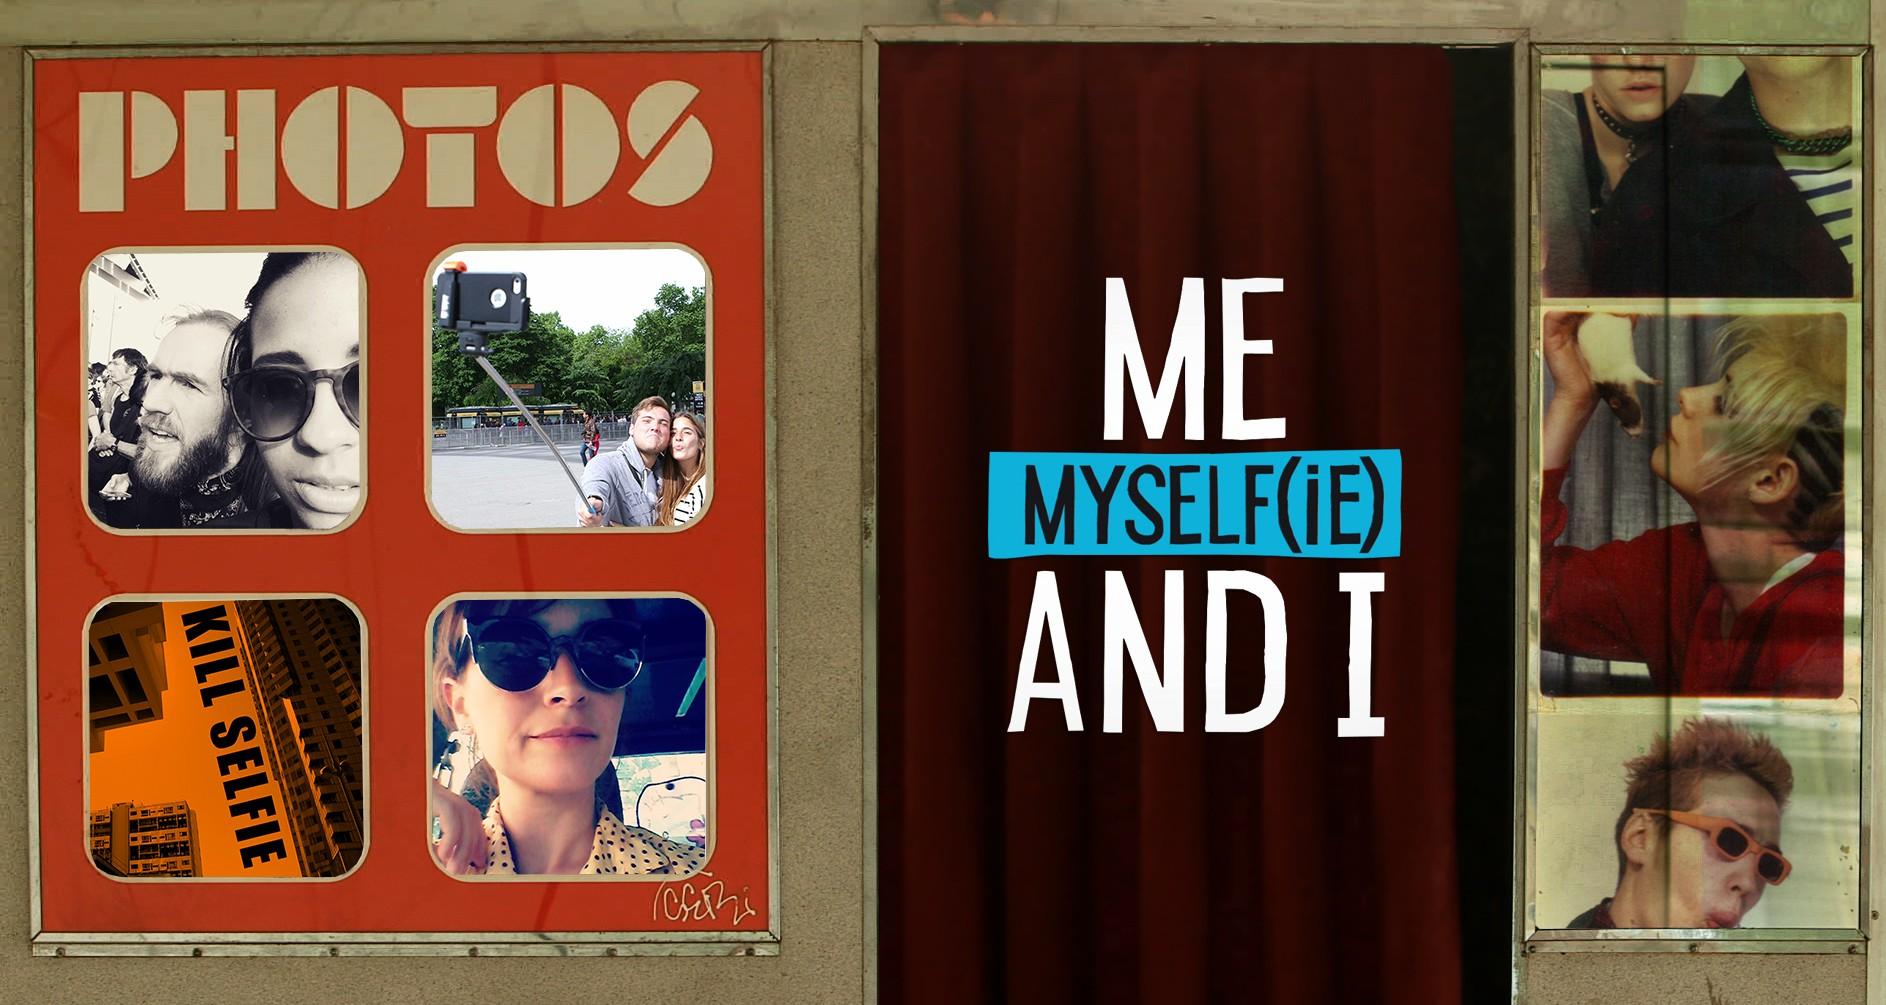 ME MYSELF(IE) AND I